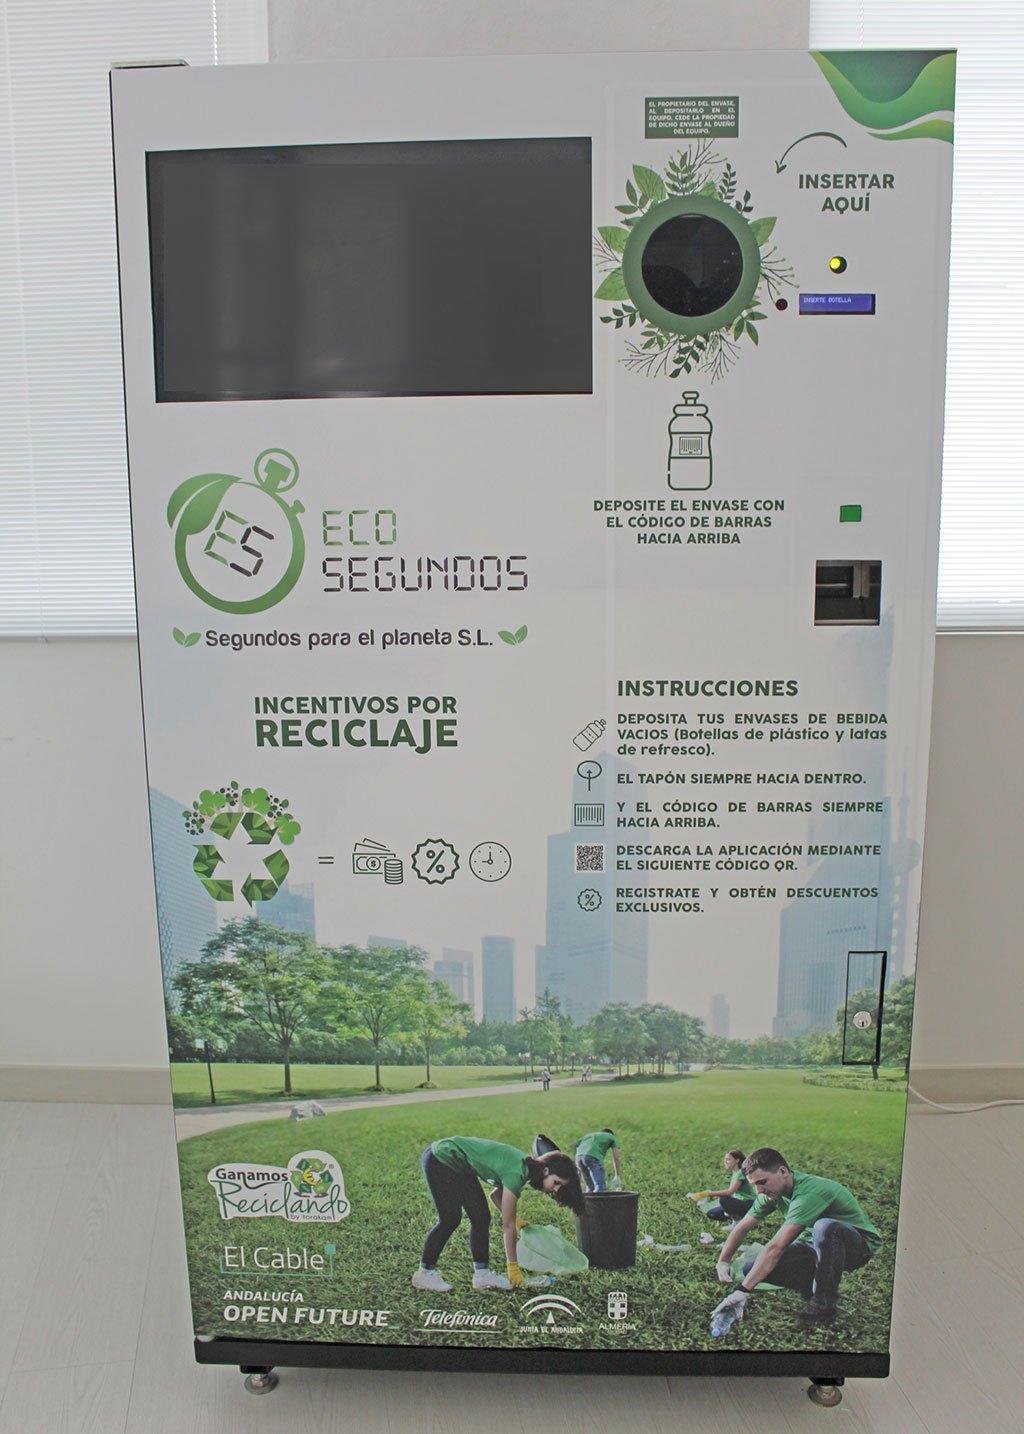 Smart container for recycling initiative in the Marina Alta - Almudena Seguros Dénia Benidorm Altea